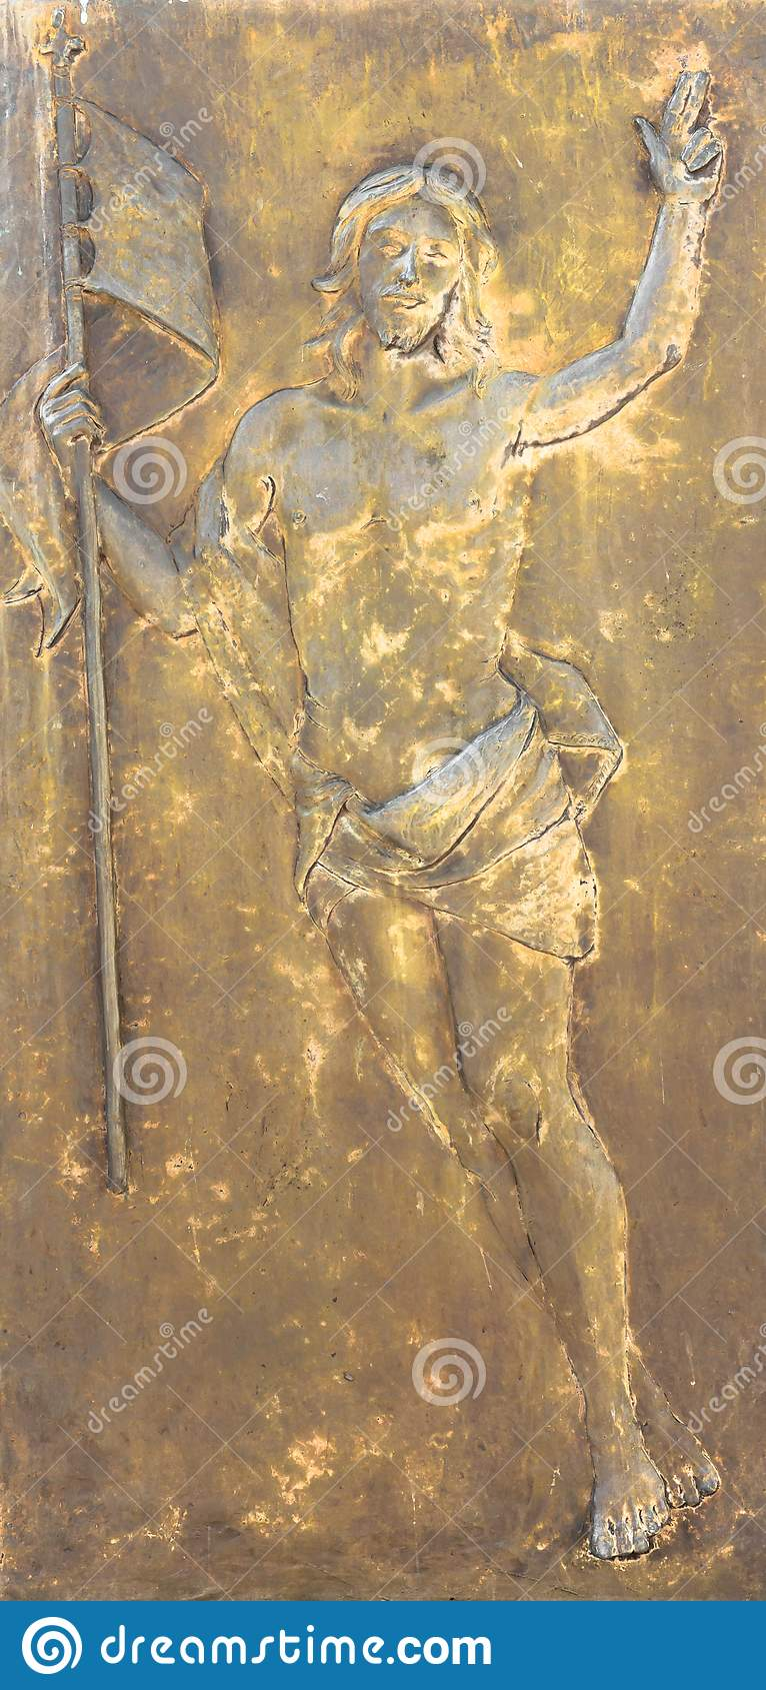 Diagramet av Jesus Christ brons in basrelief